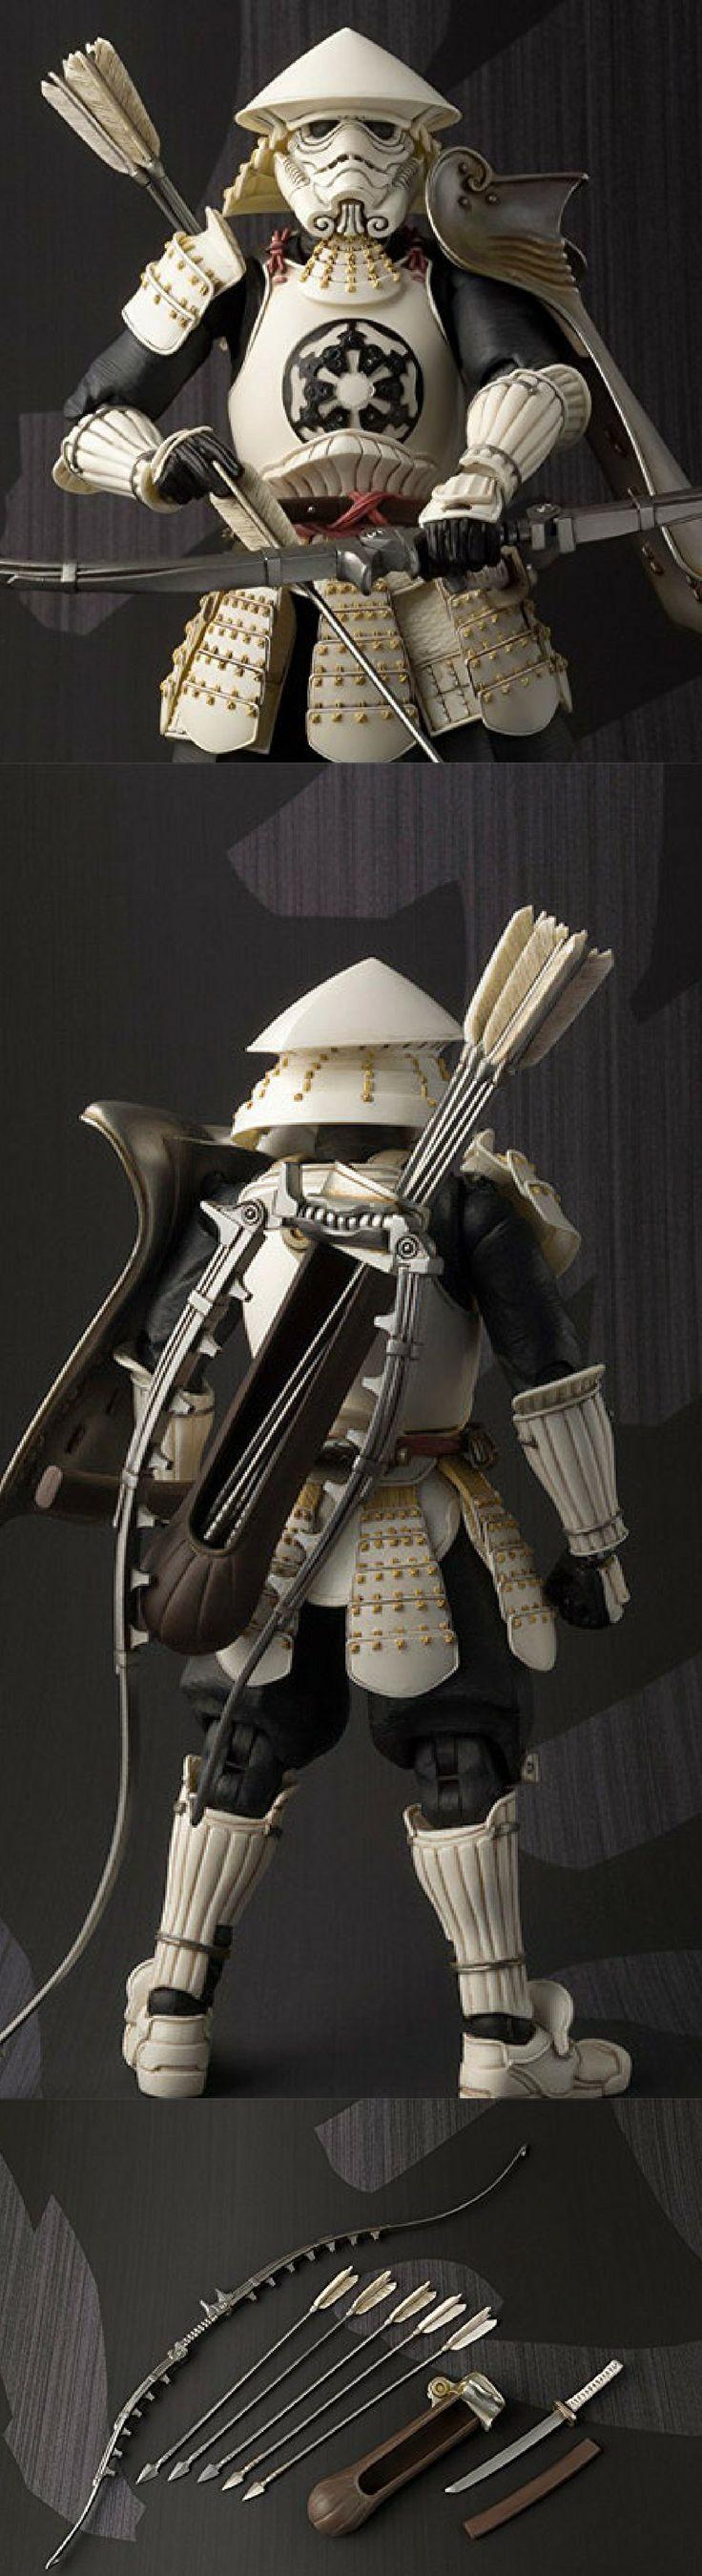 Bandai Stormtrooper Star Wars Action Figure - Star Wars Figures #starwars #figure #jedi #stormtrooper